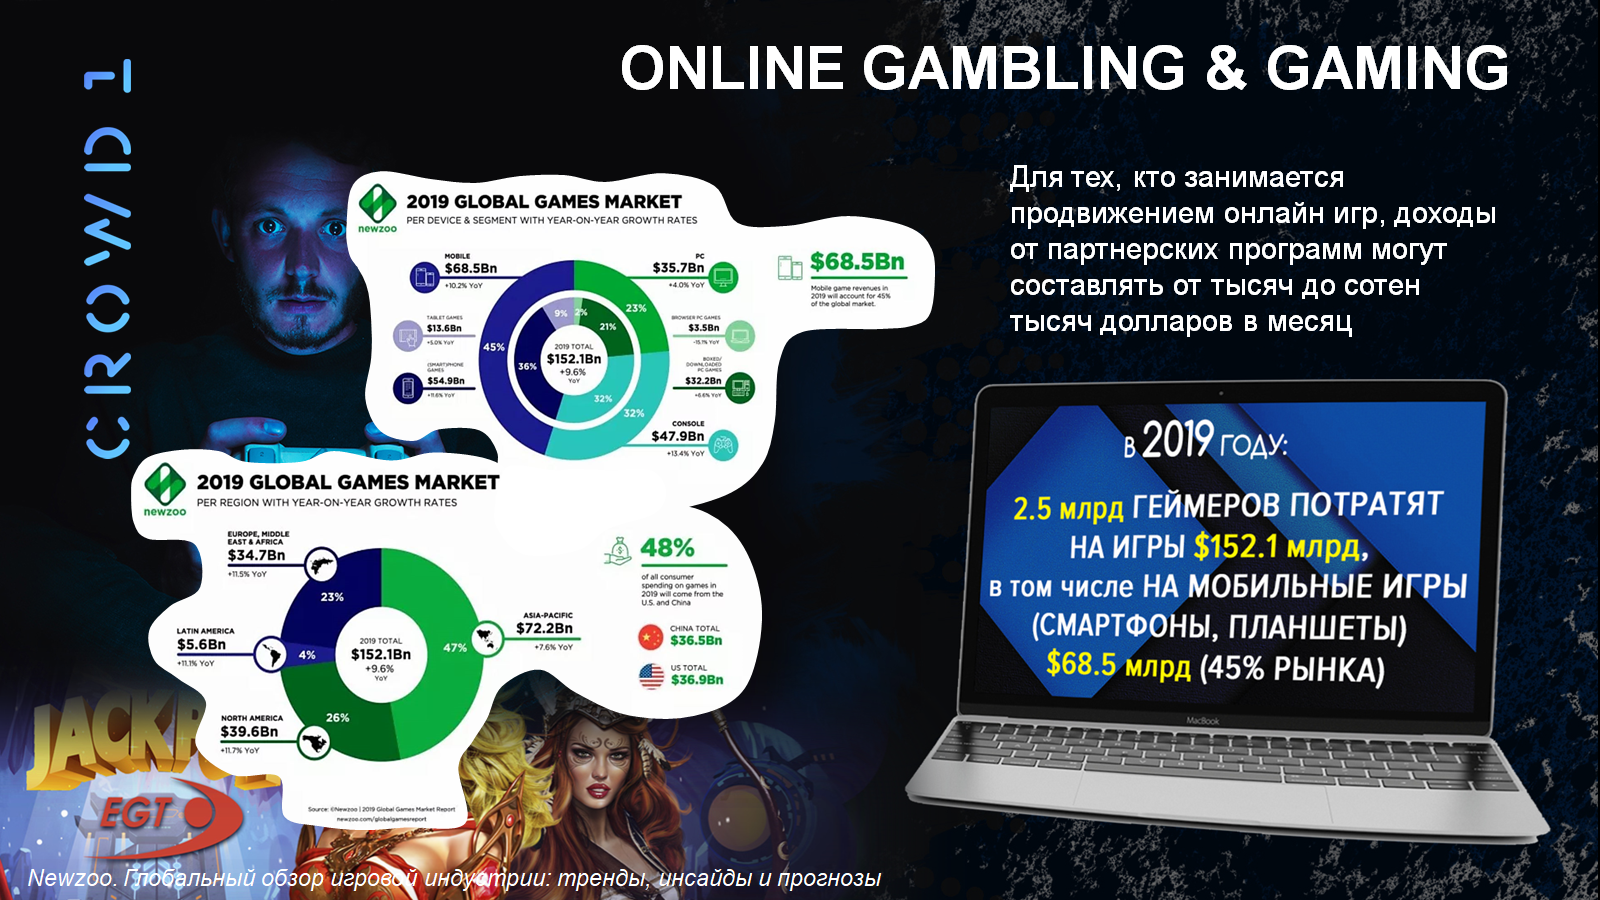 Статистика игровой индустрии за 2019 год